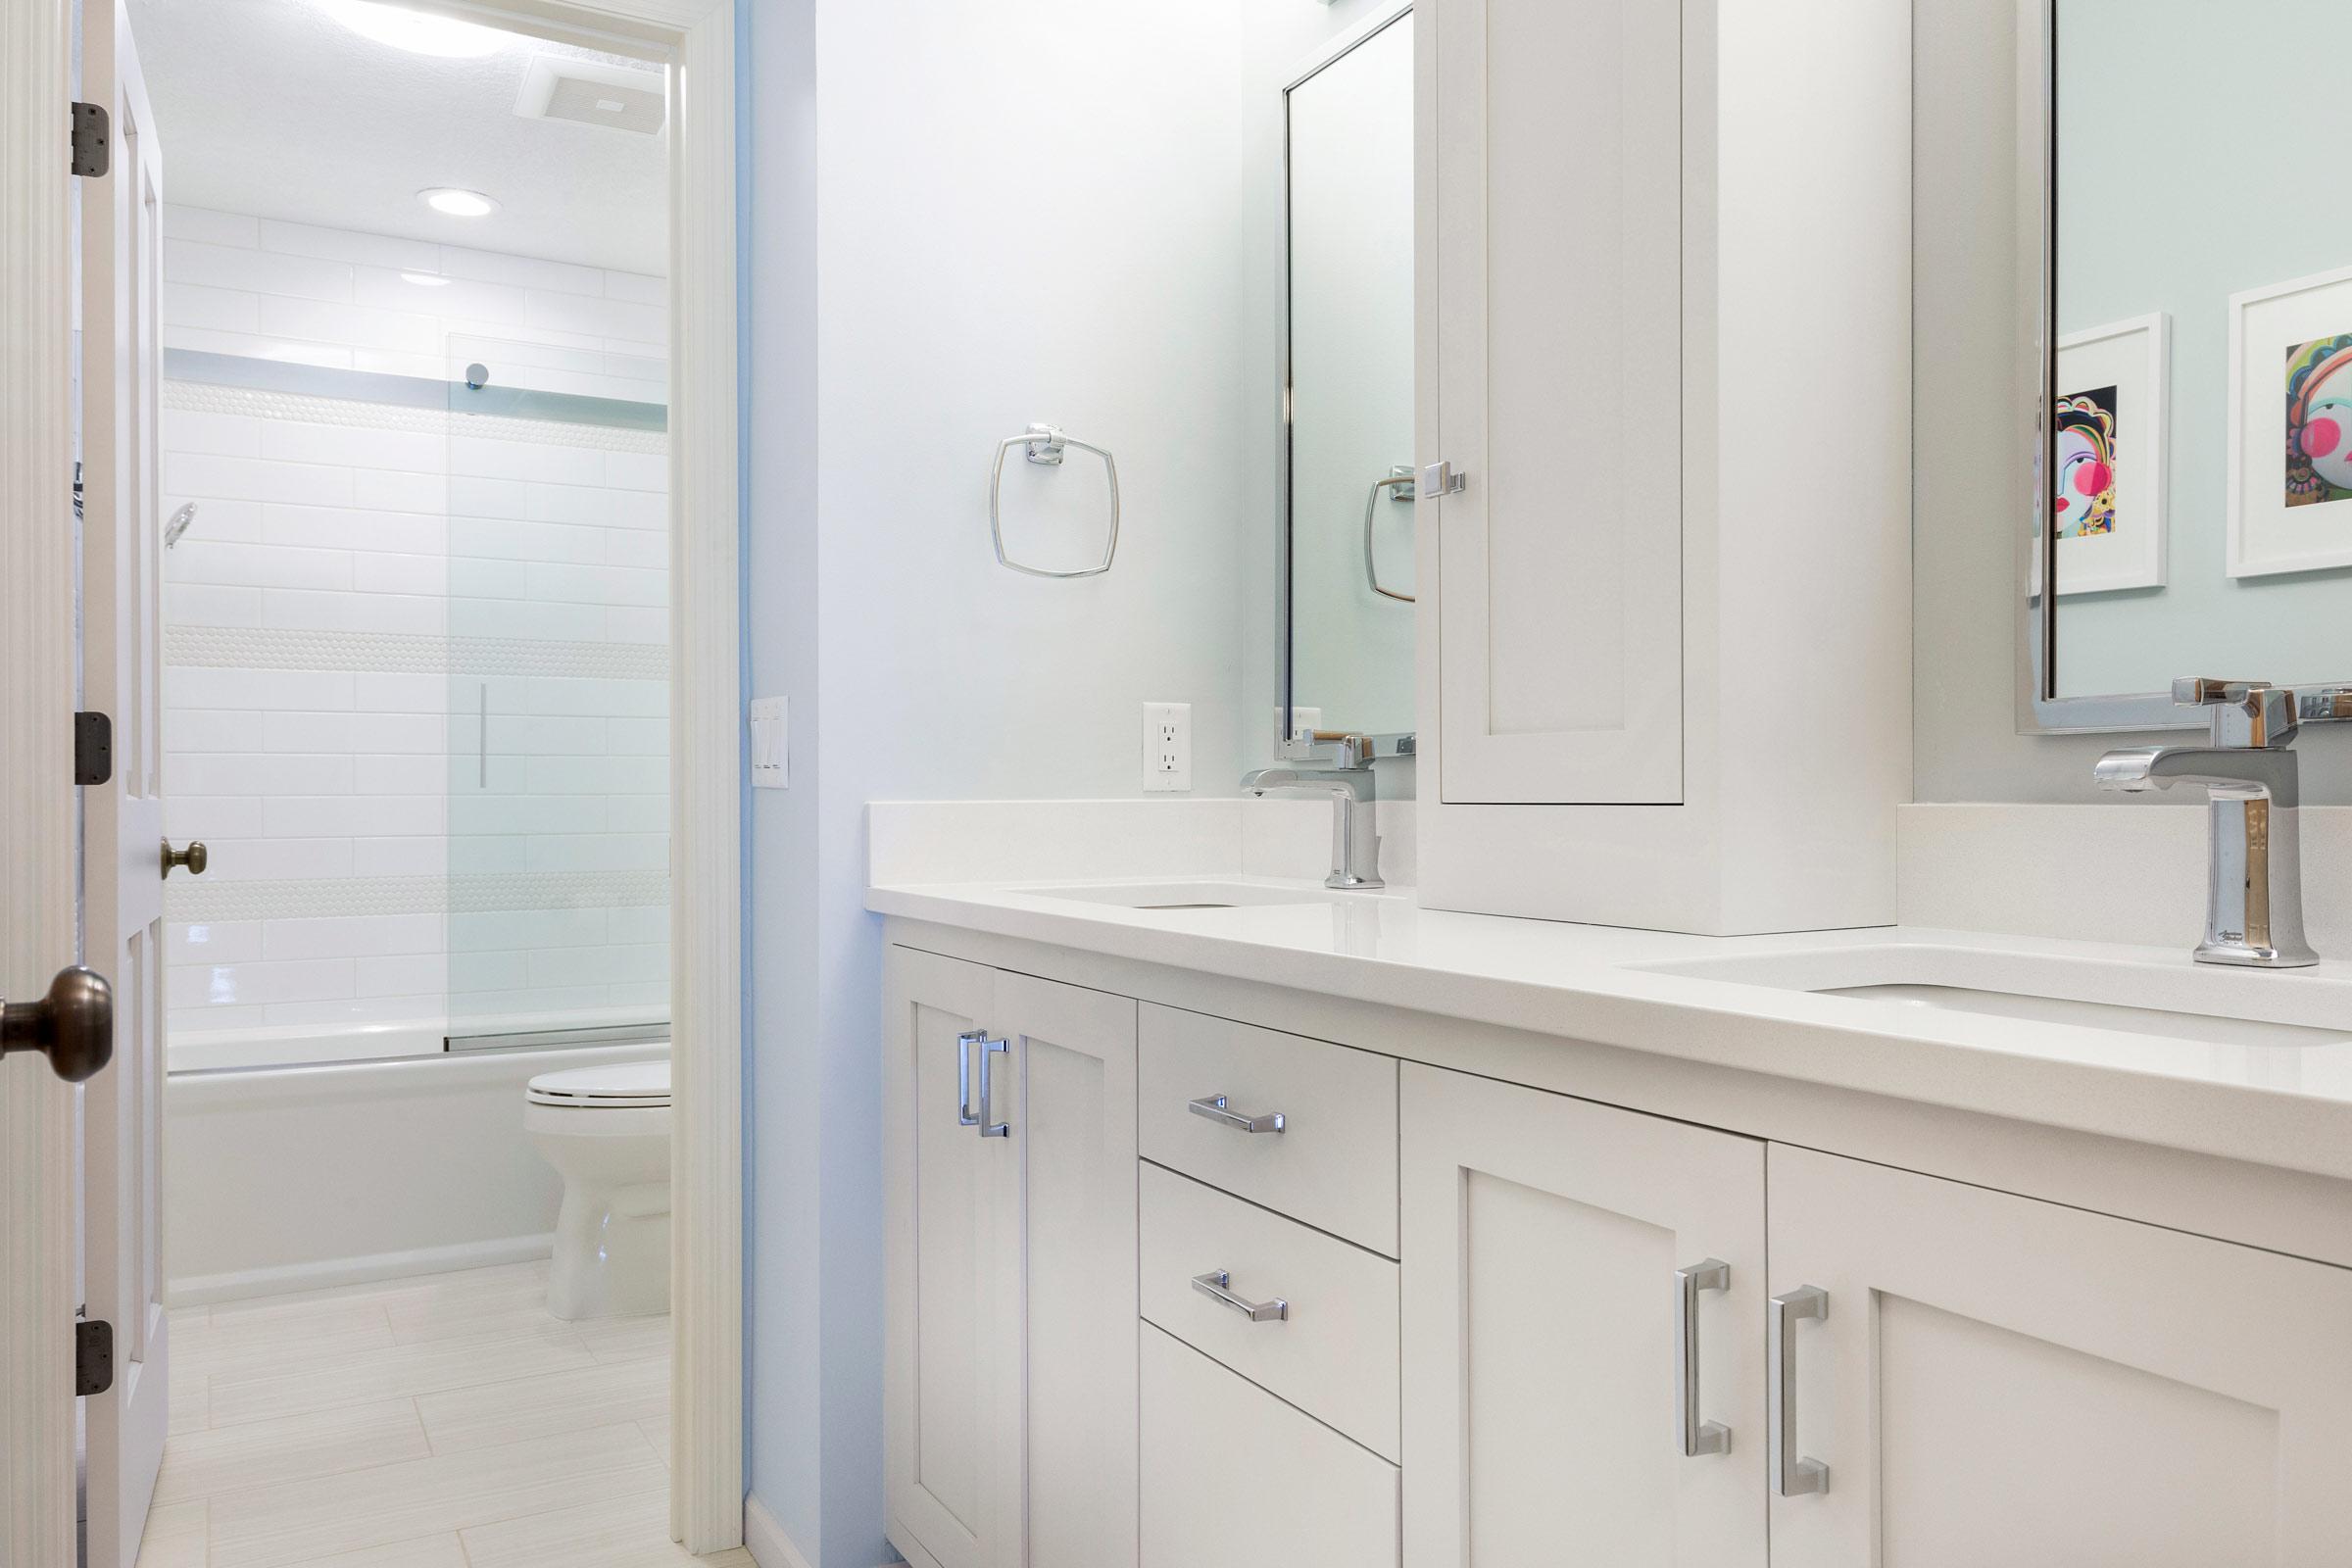 Bath and shower design for teenage girl, double vanity, light walls and cabinets, white tile - Maven Design Studio